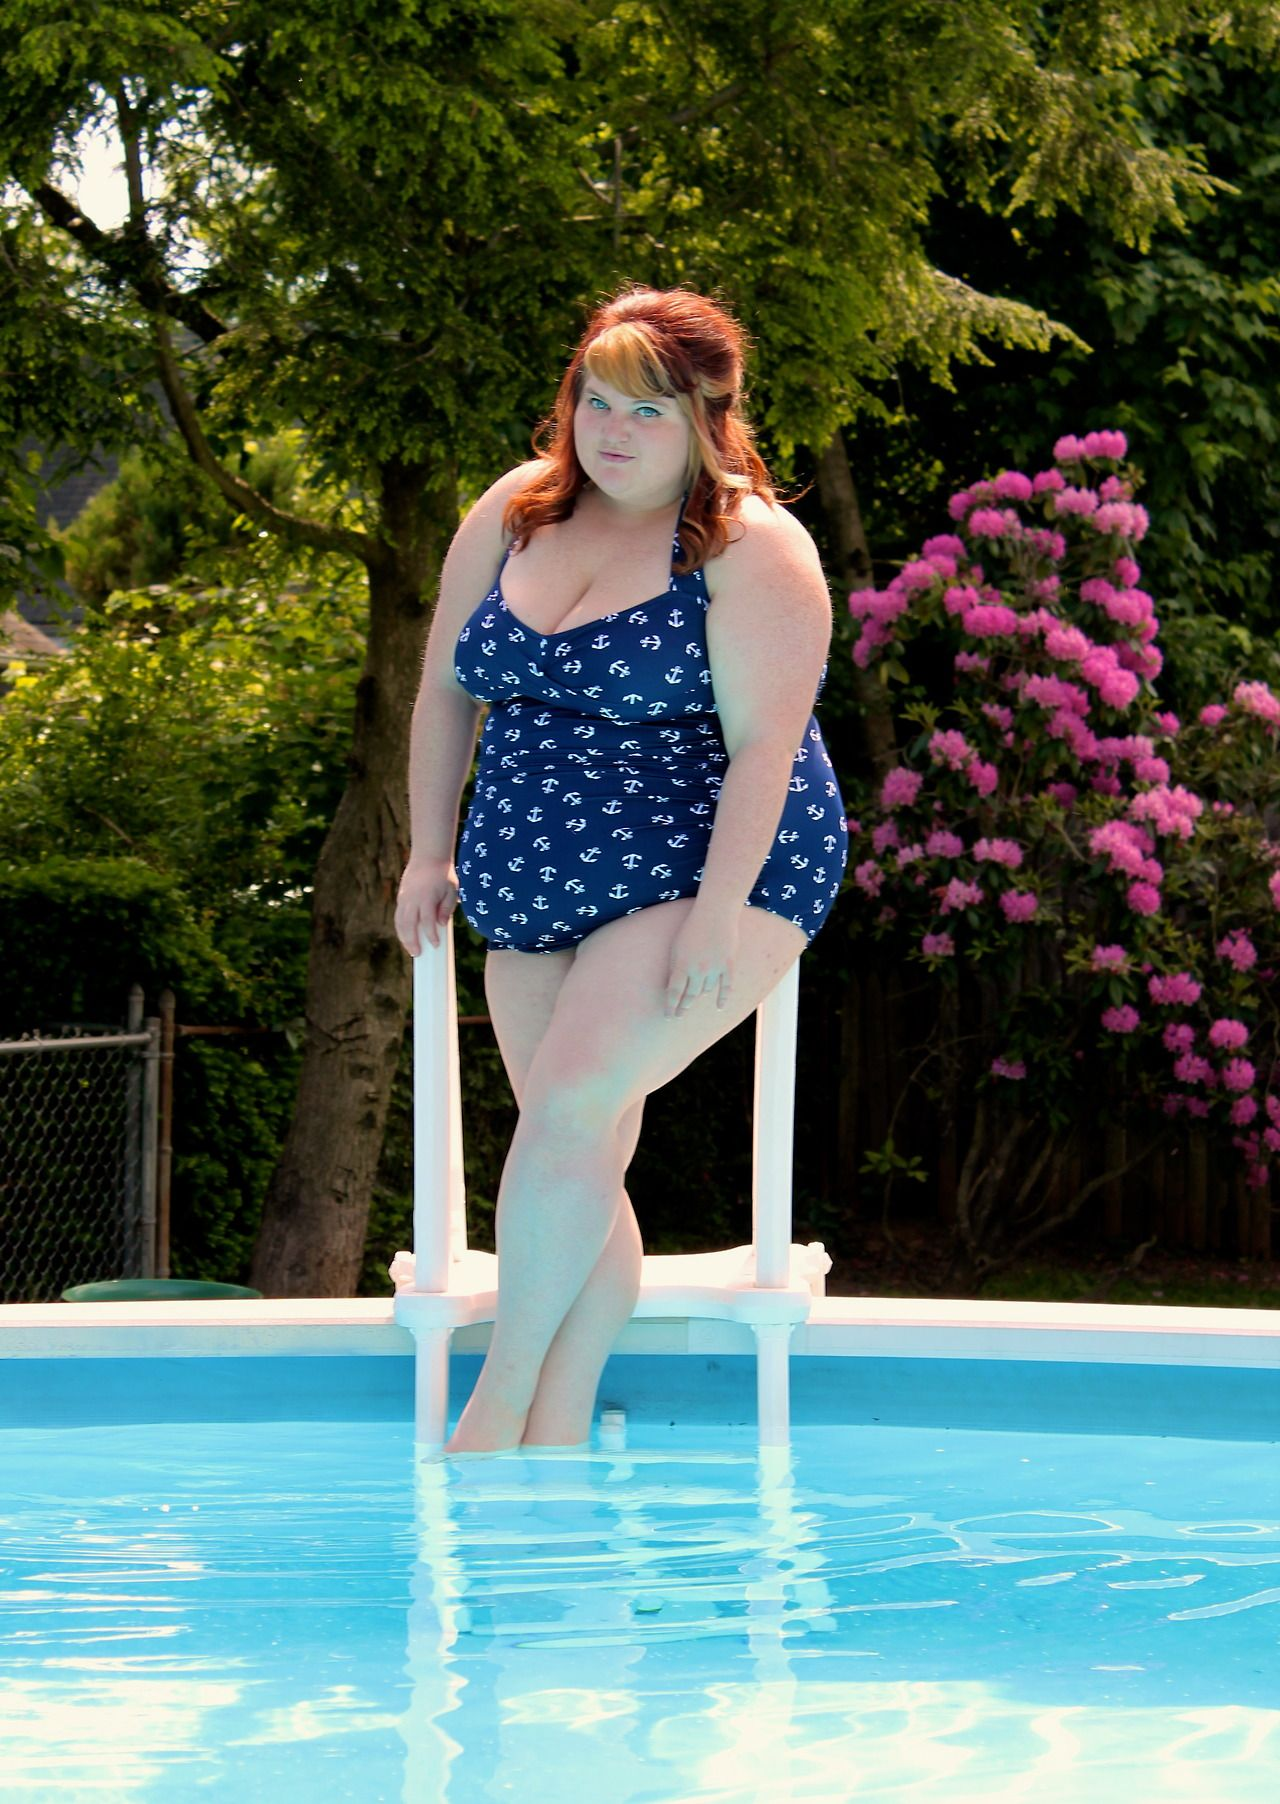 swimsuit | bikini bbw | pinterest | swimsuits, ssbbw and curves